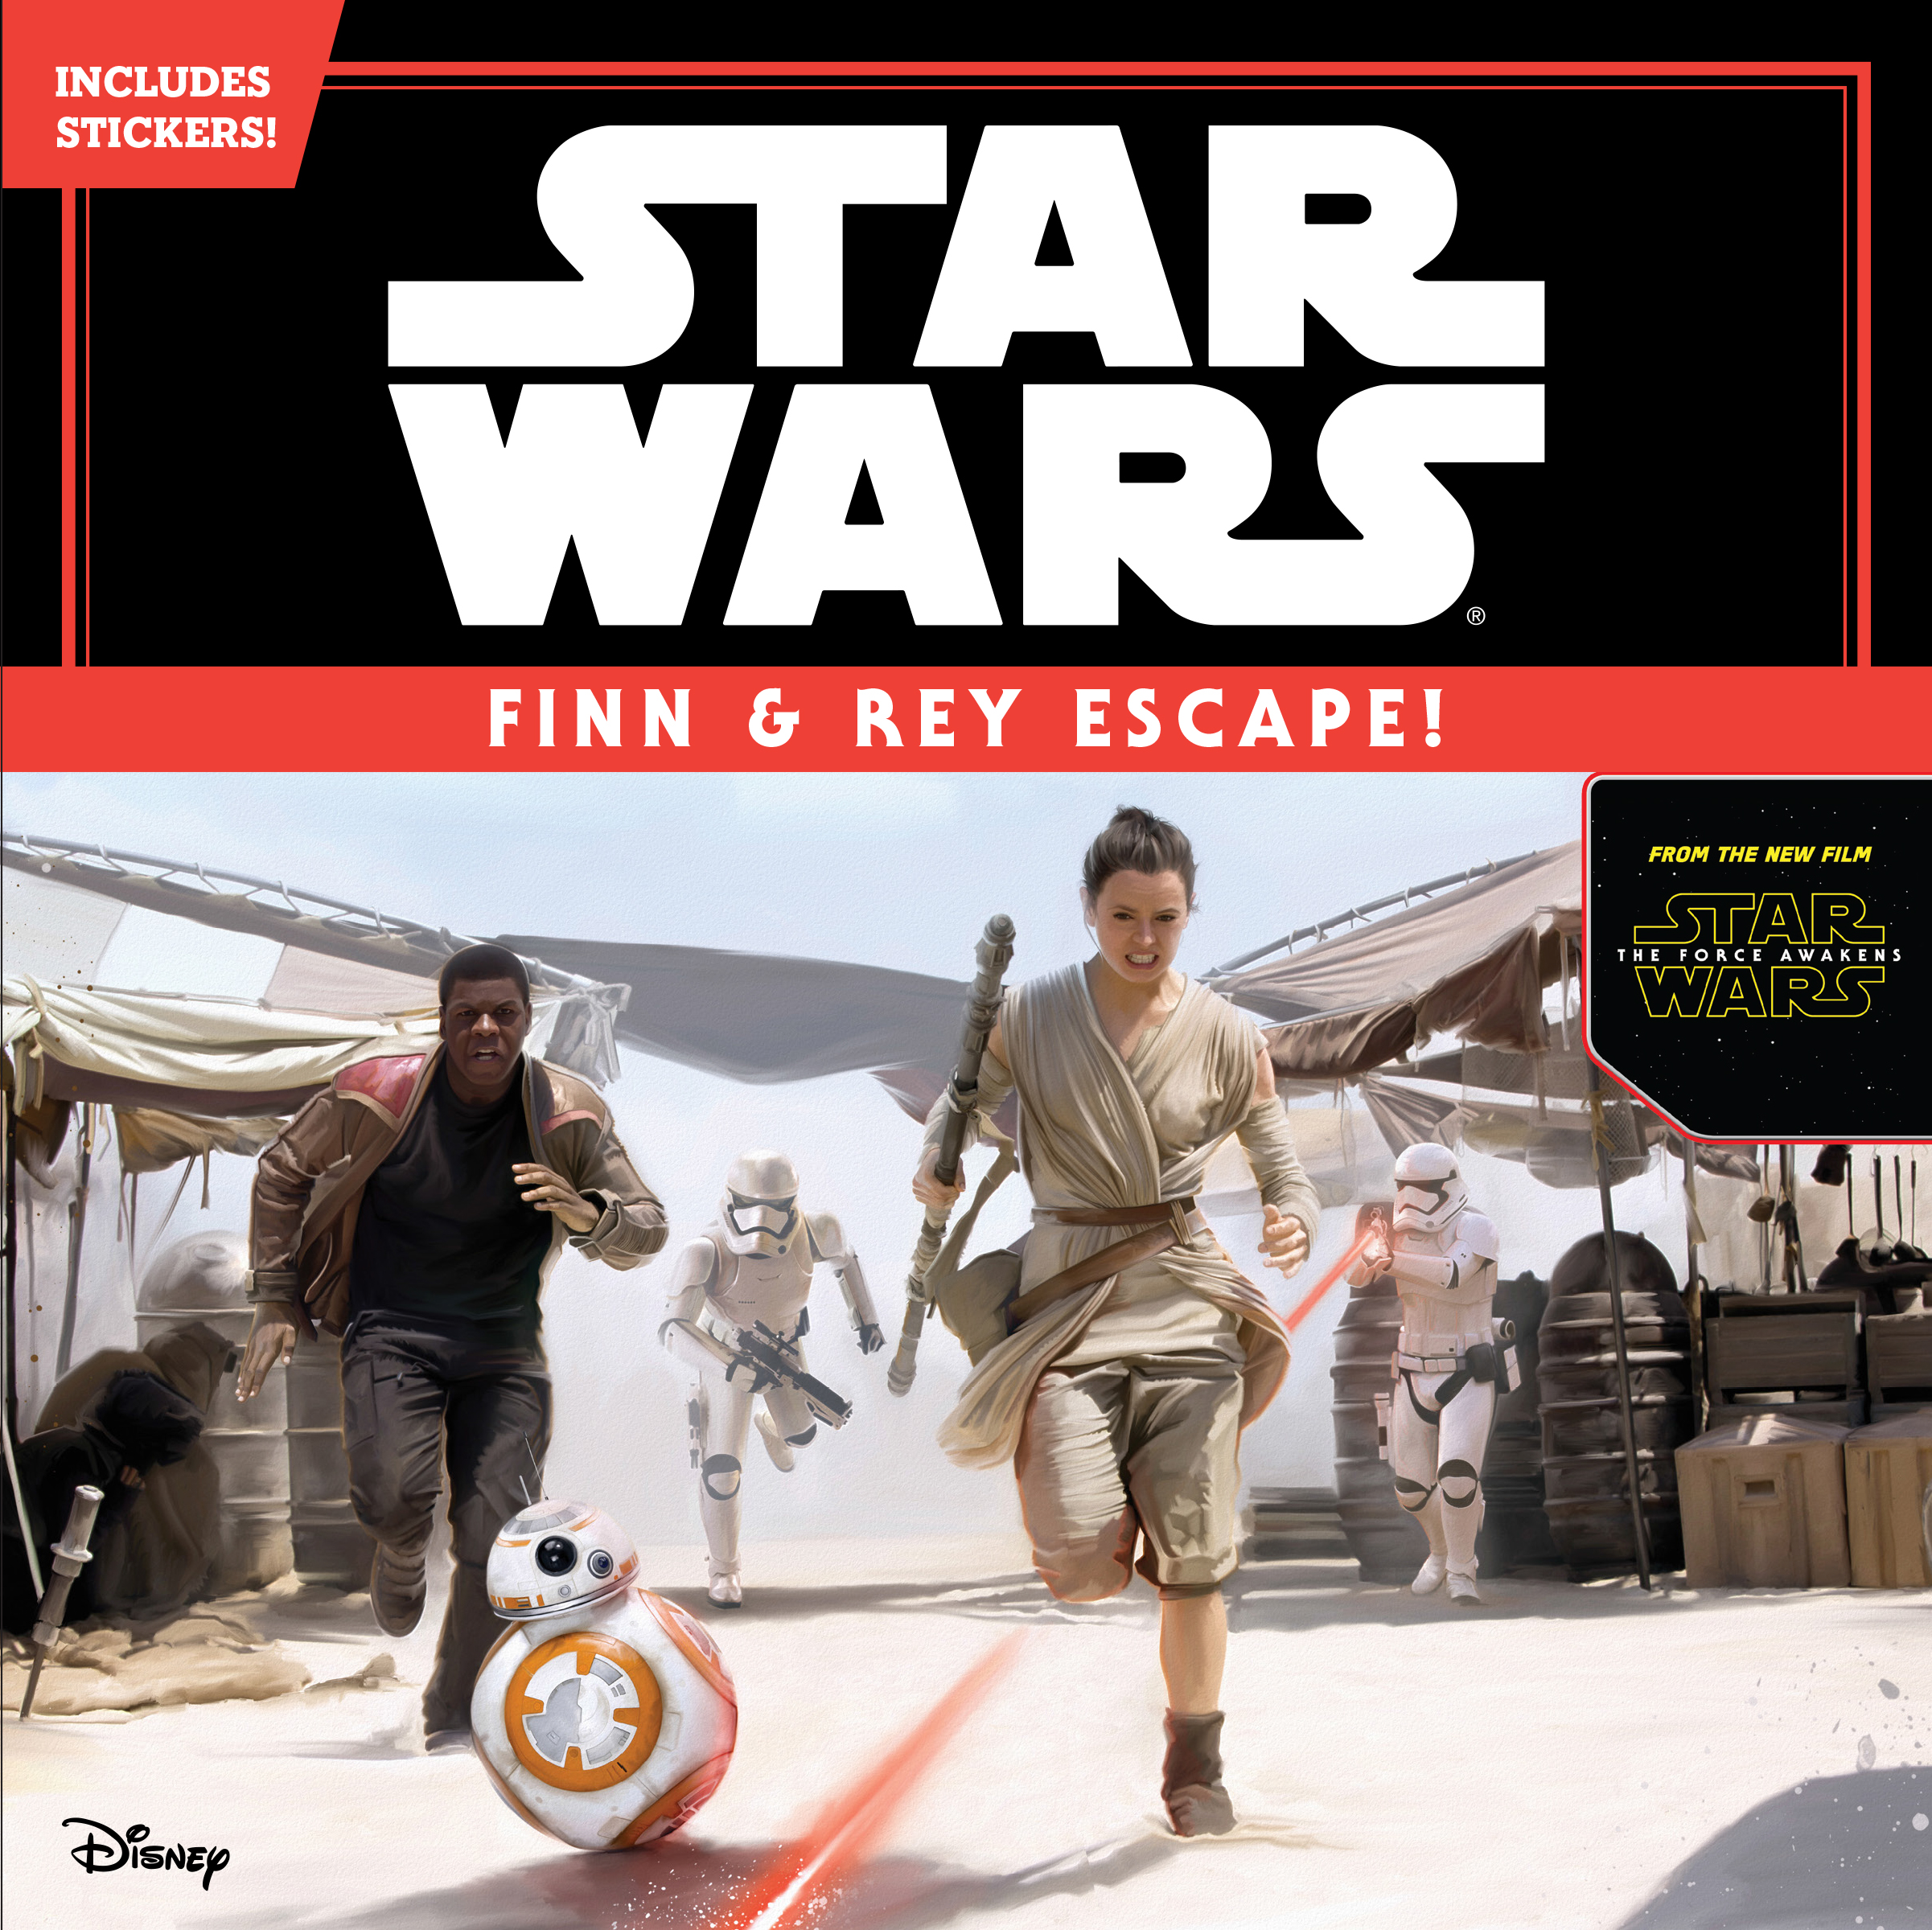 Finn & Rey Escape!